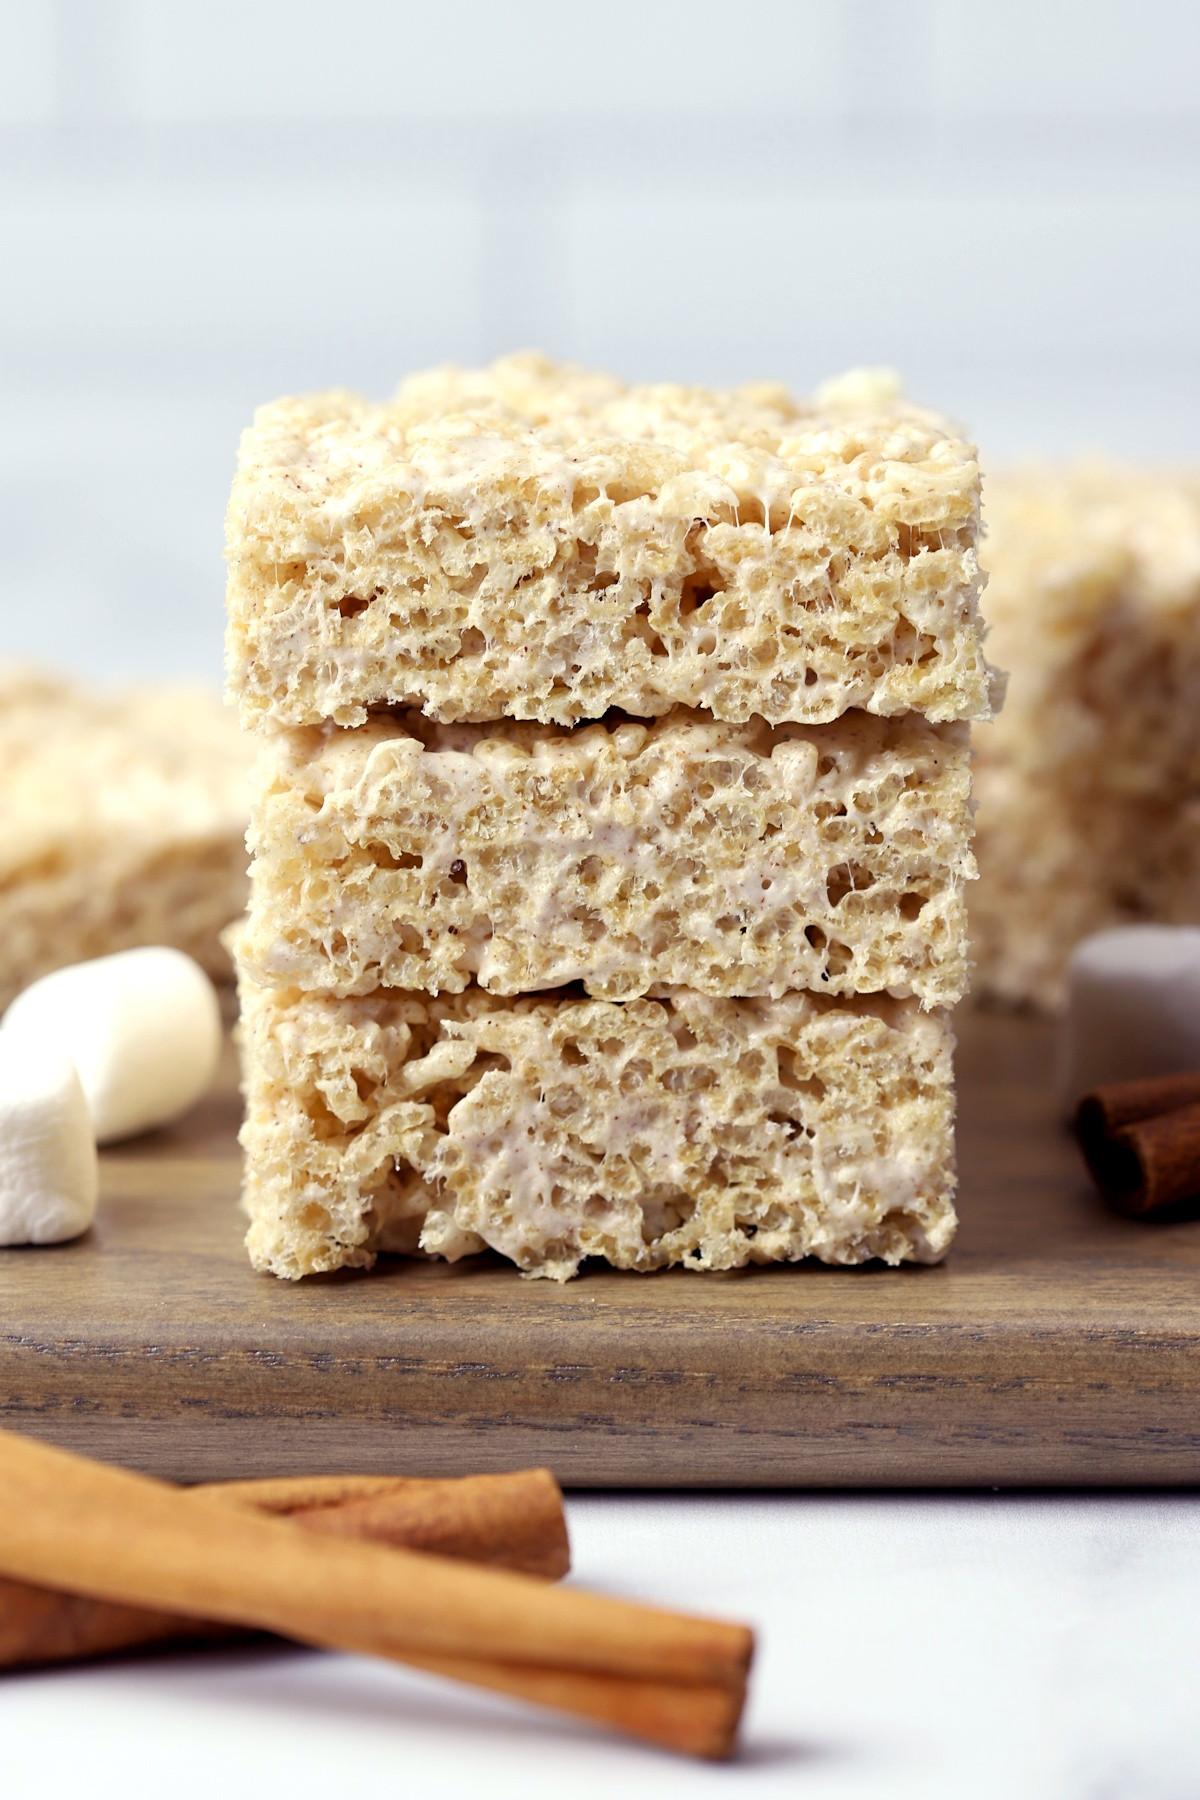 A stack of three rice krispies treats.